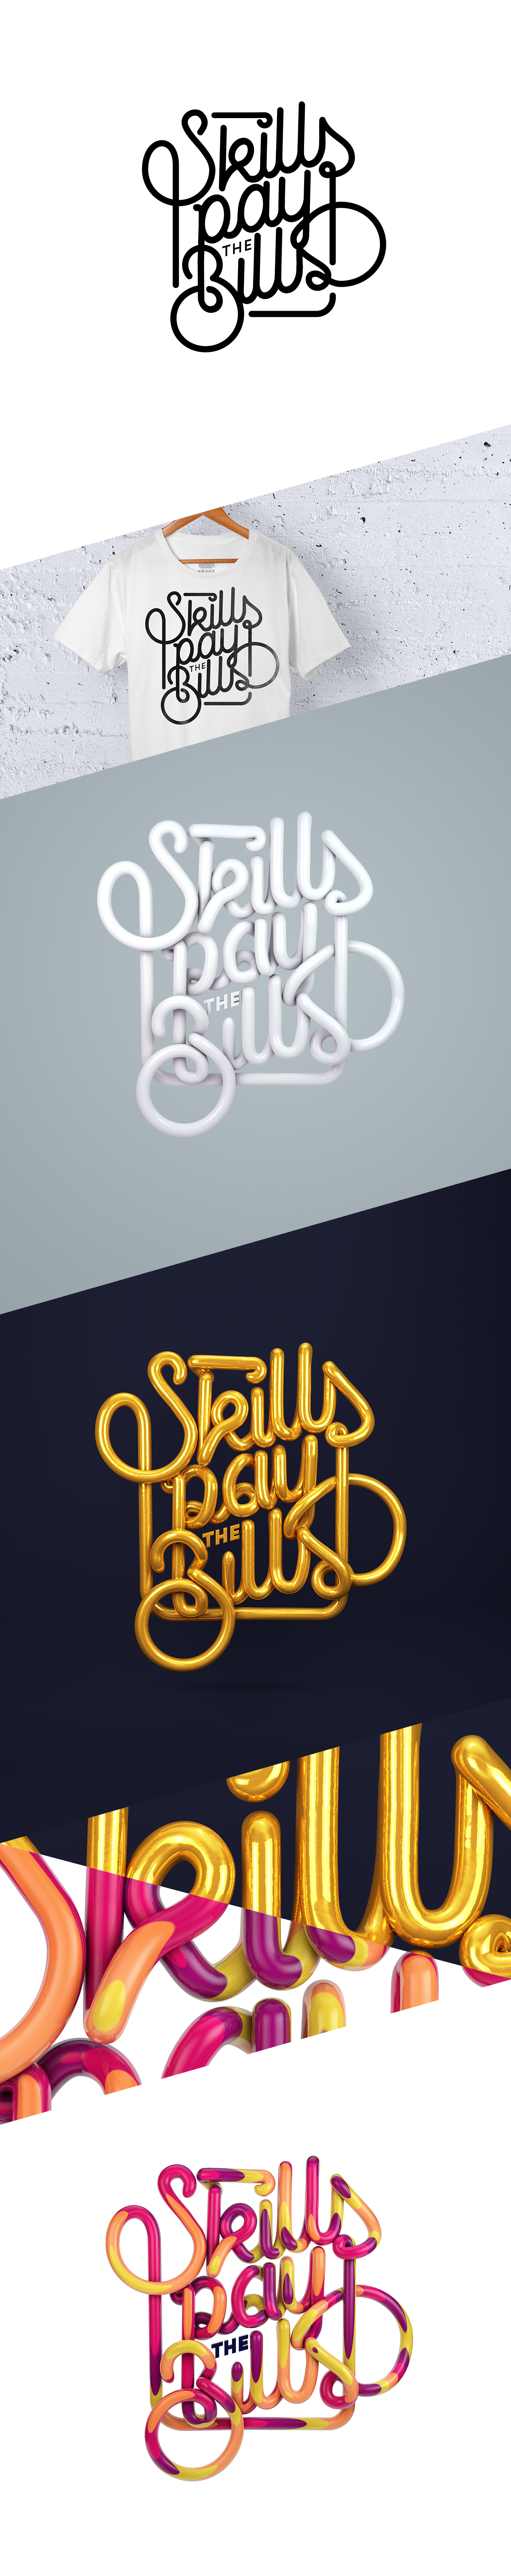 skills Pay the bills claudiosc8 3D lettering rendering